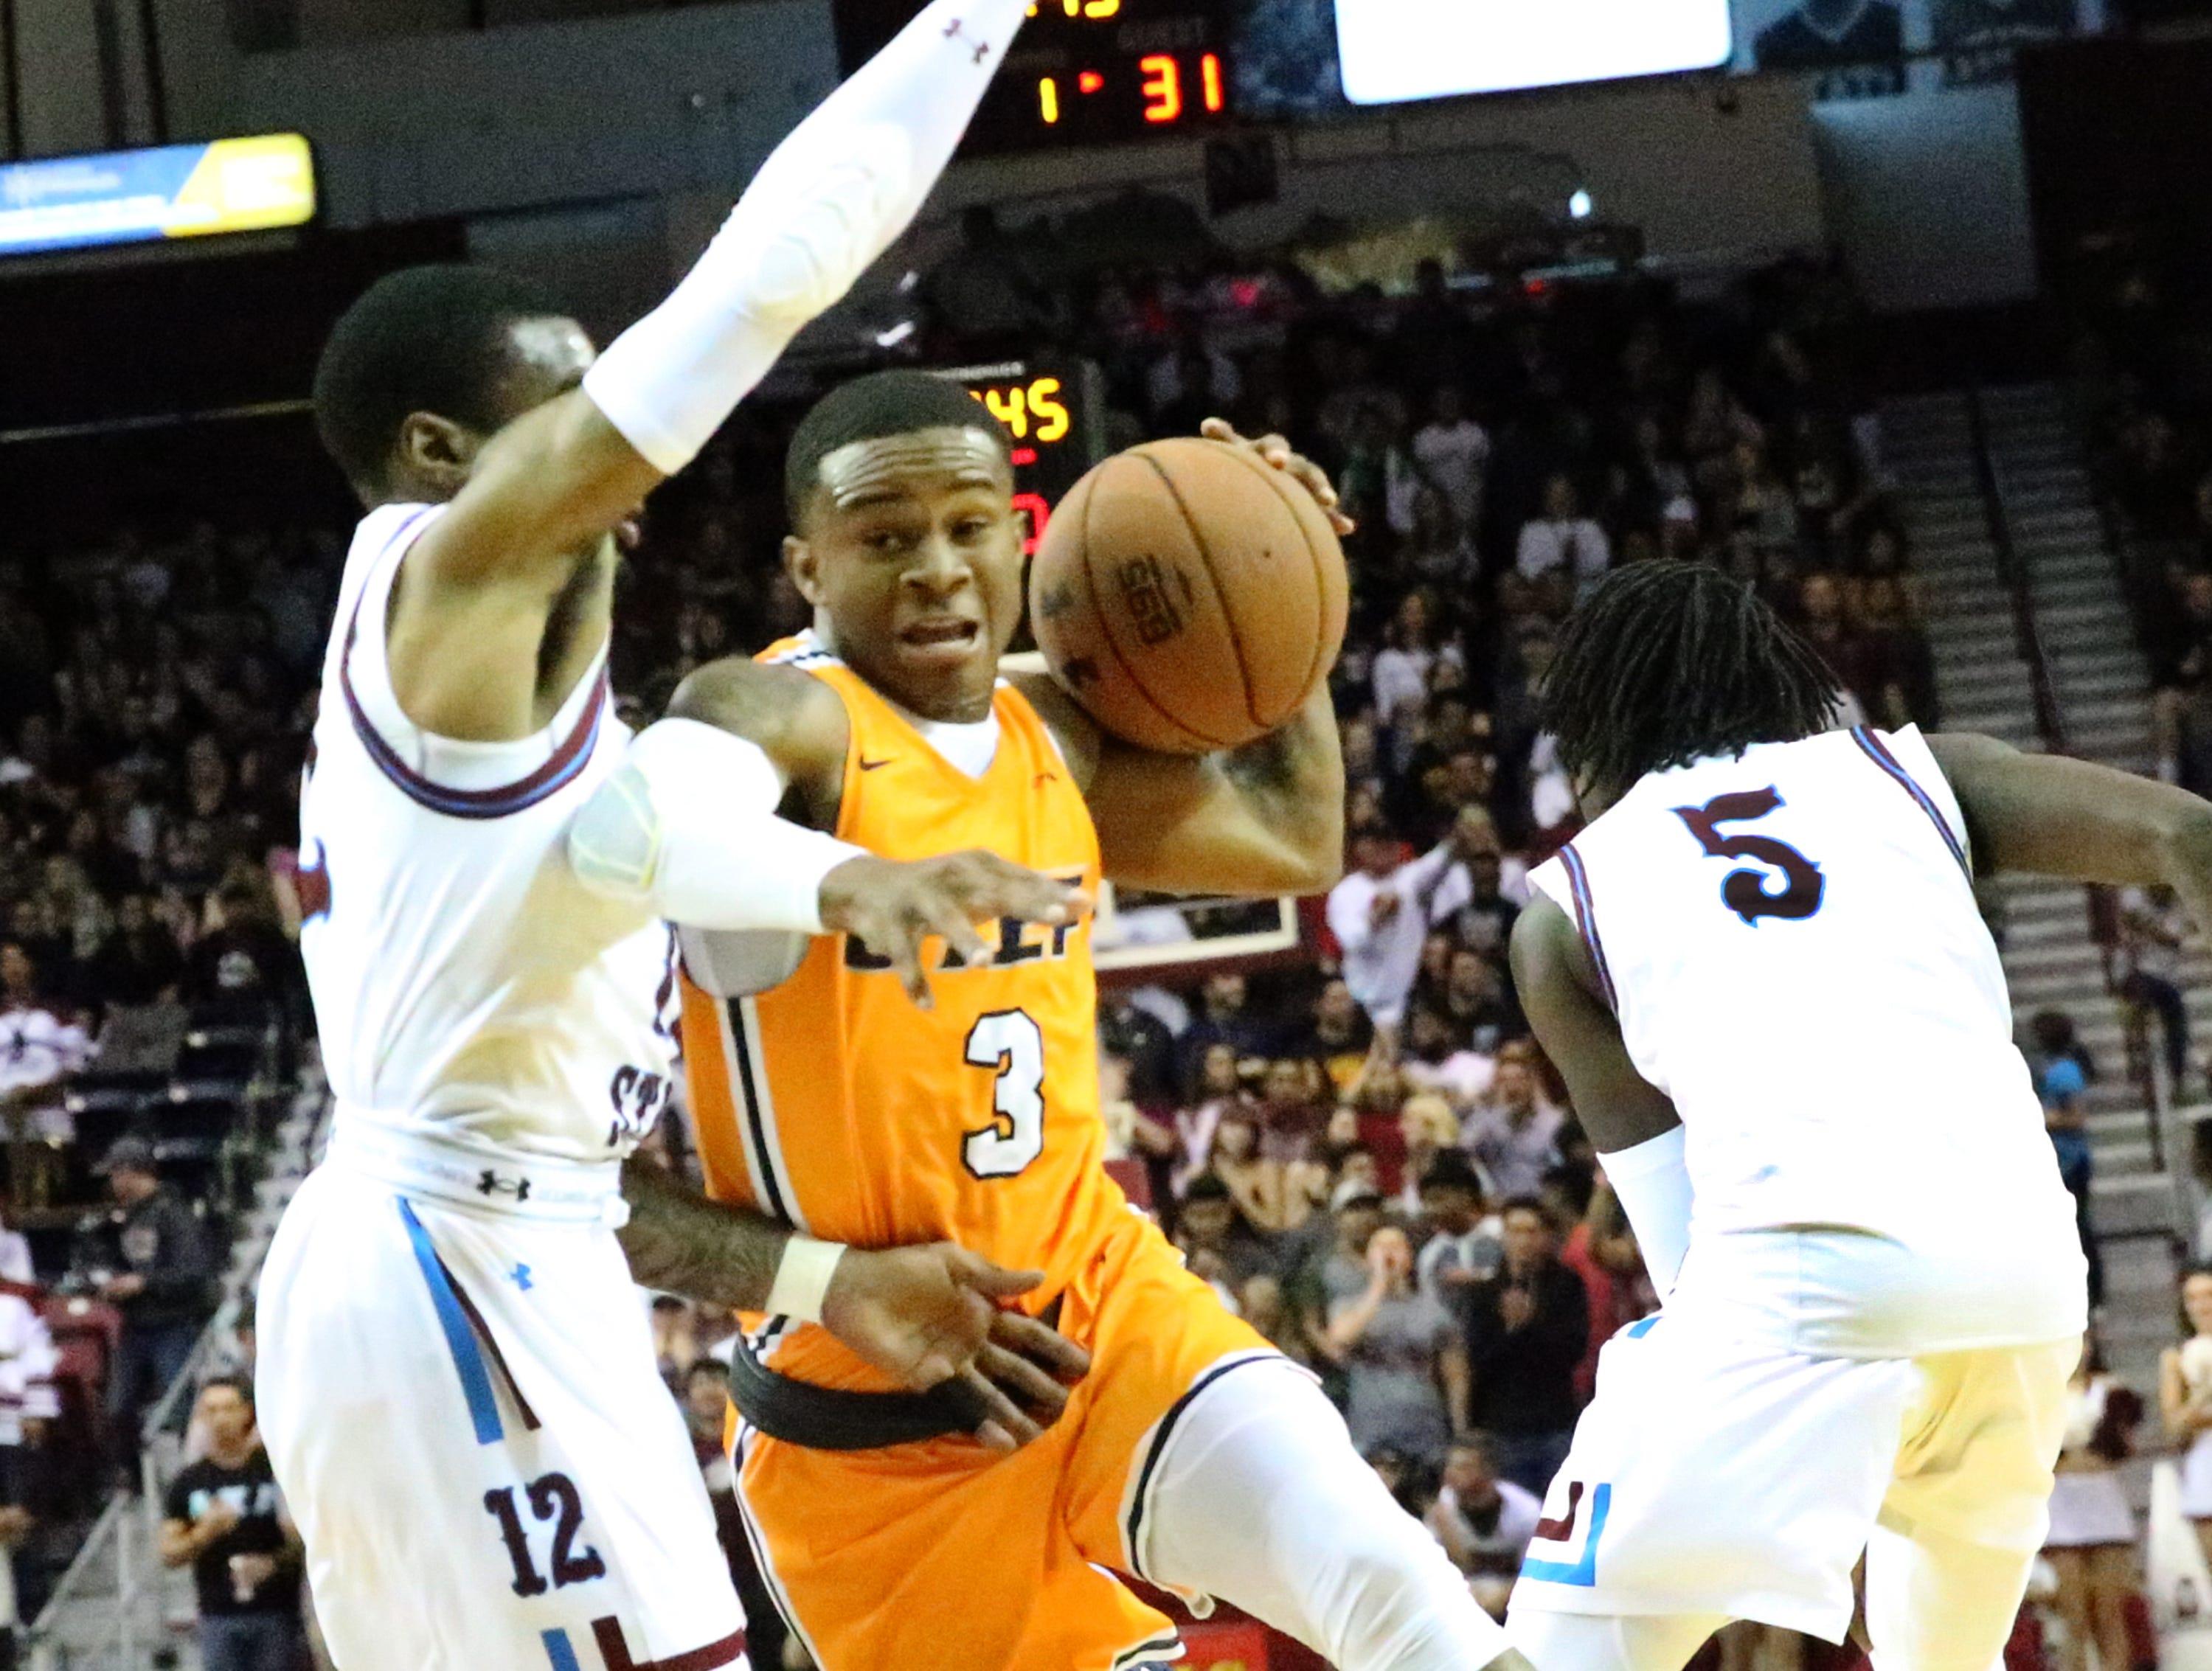 UTEP men's basketball returns home Monday against Eastern New Mexico